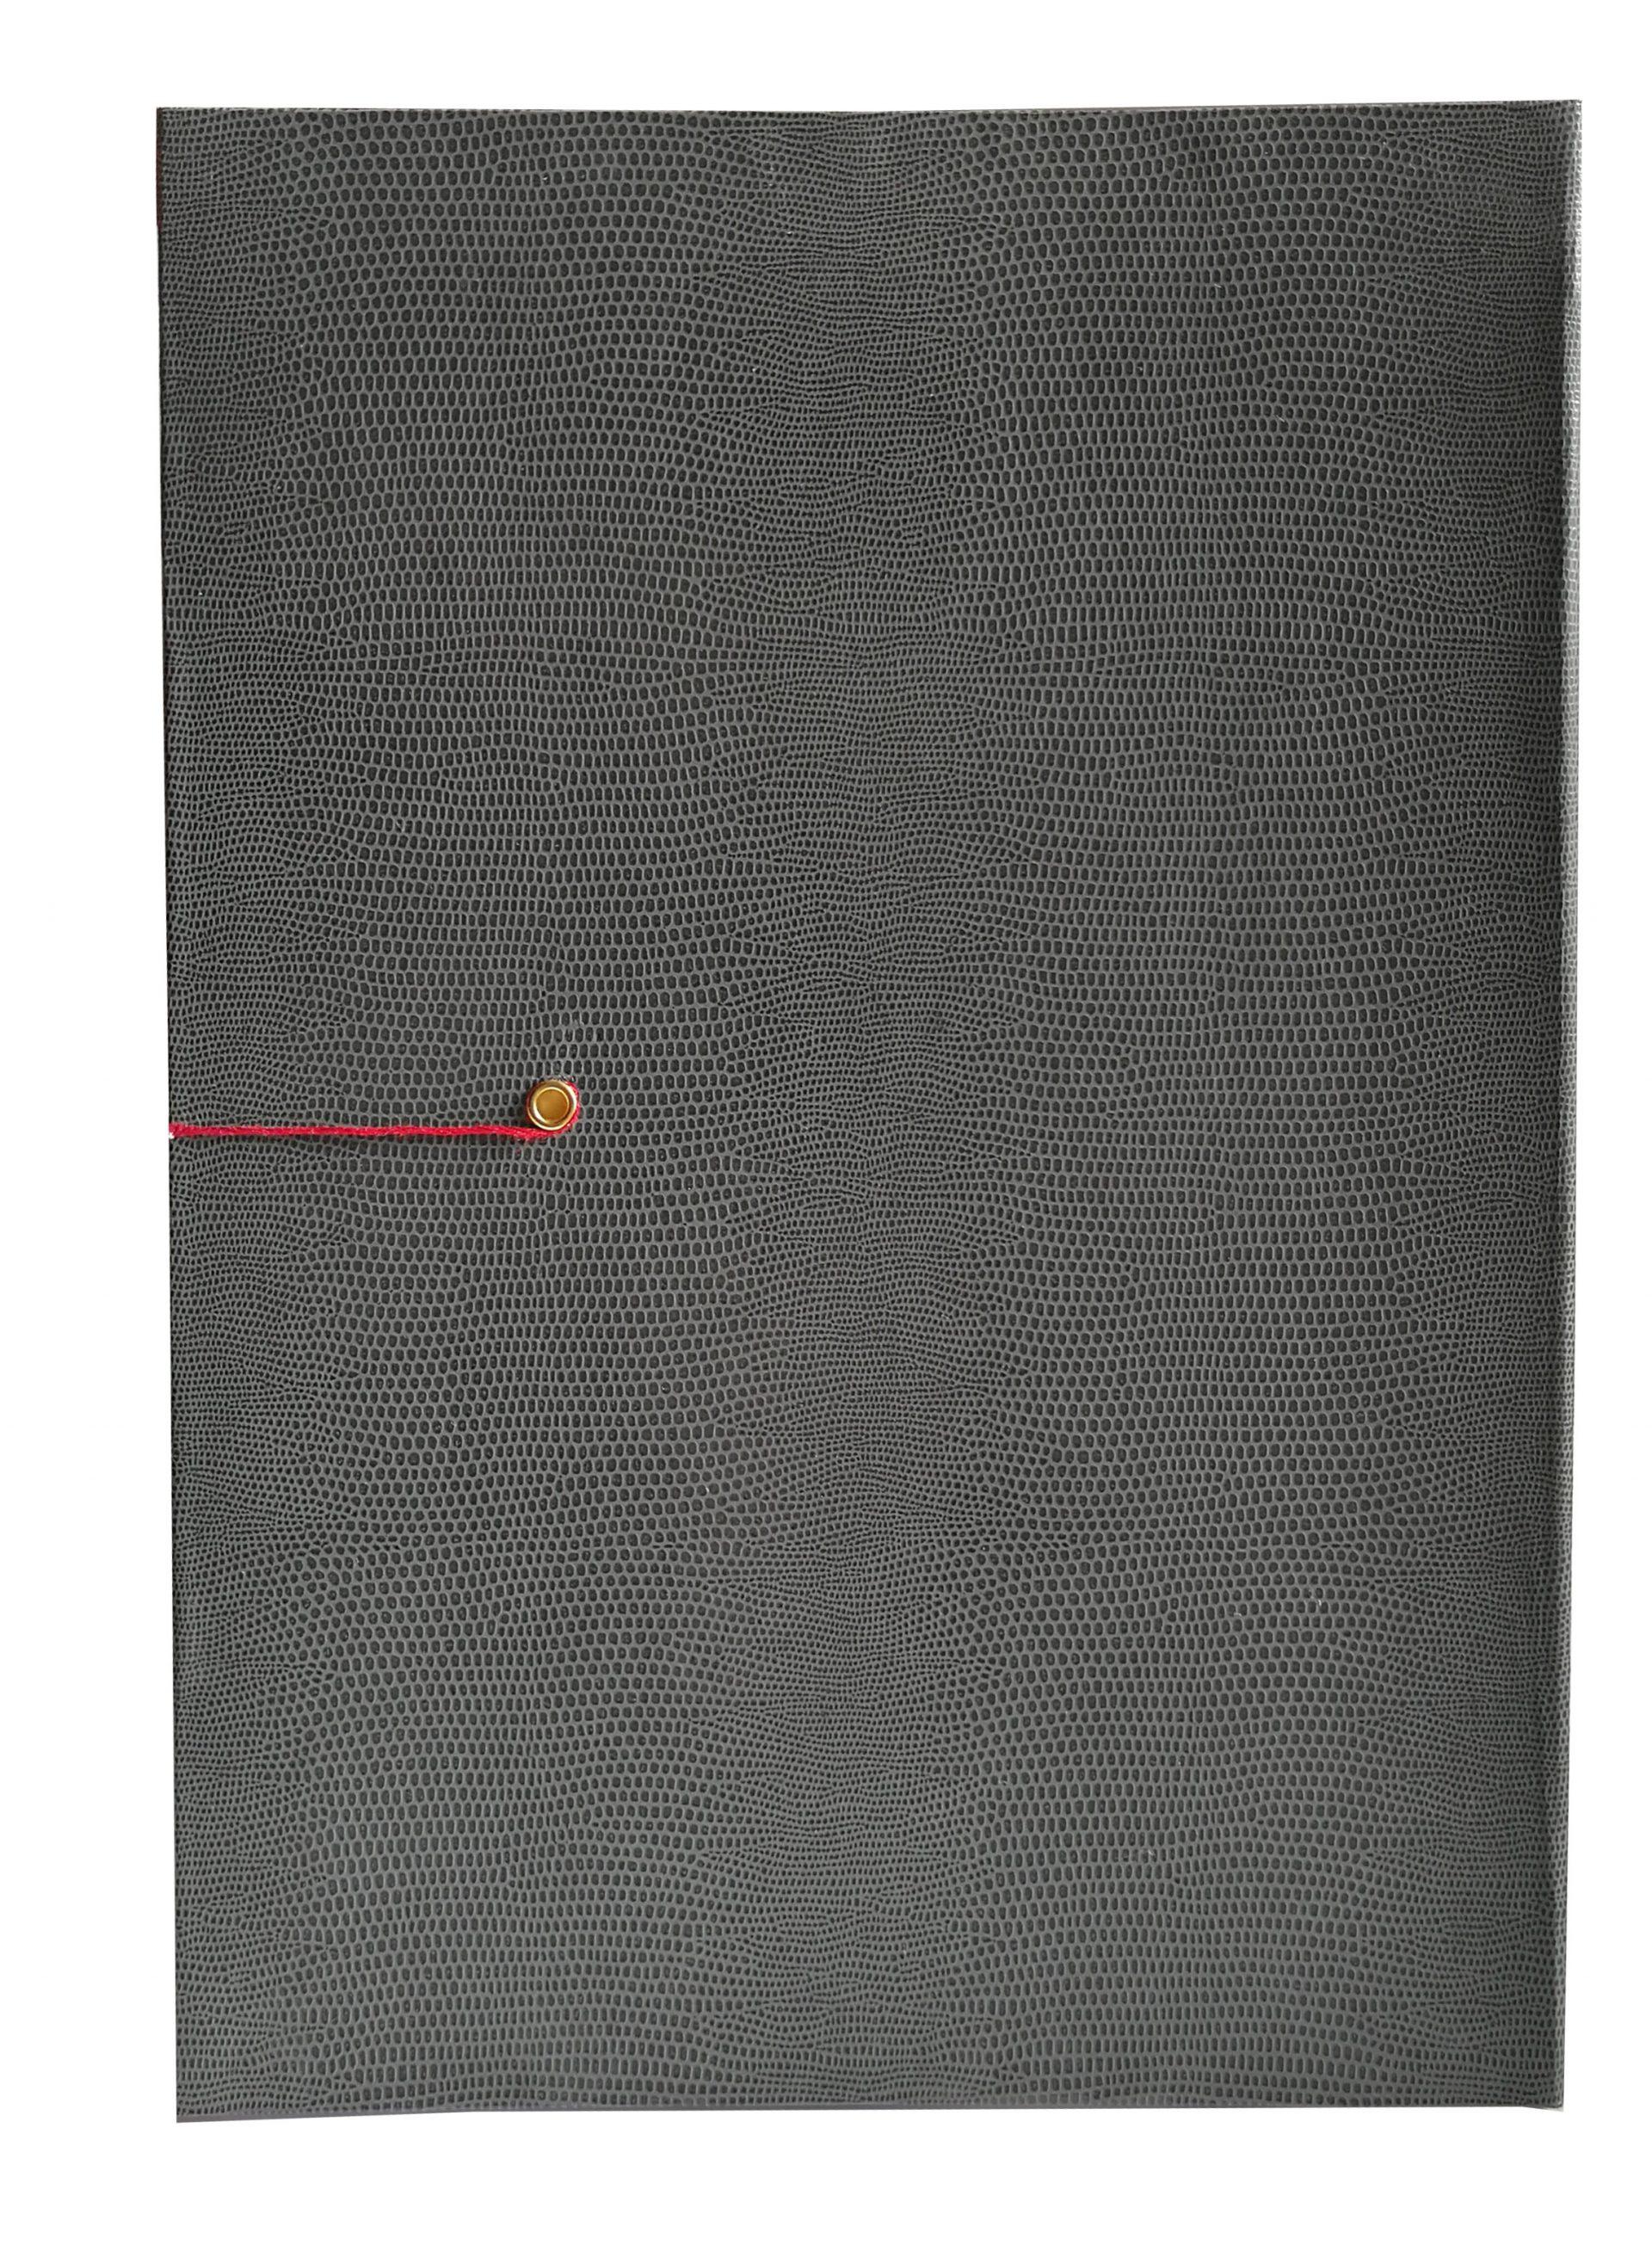 Quaderno Grande A4 Grigio 2